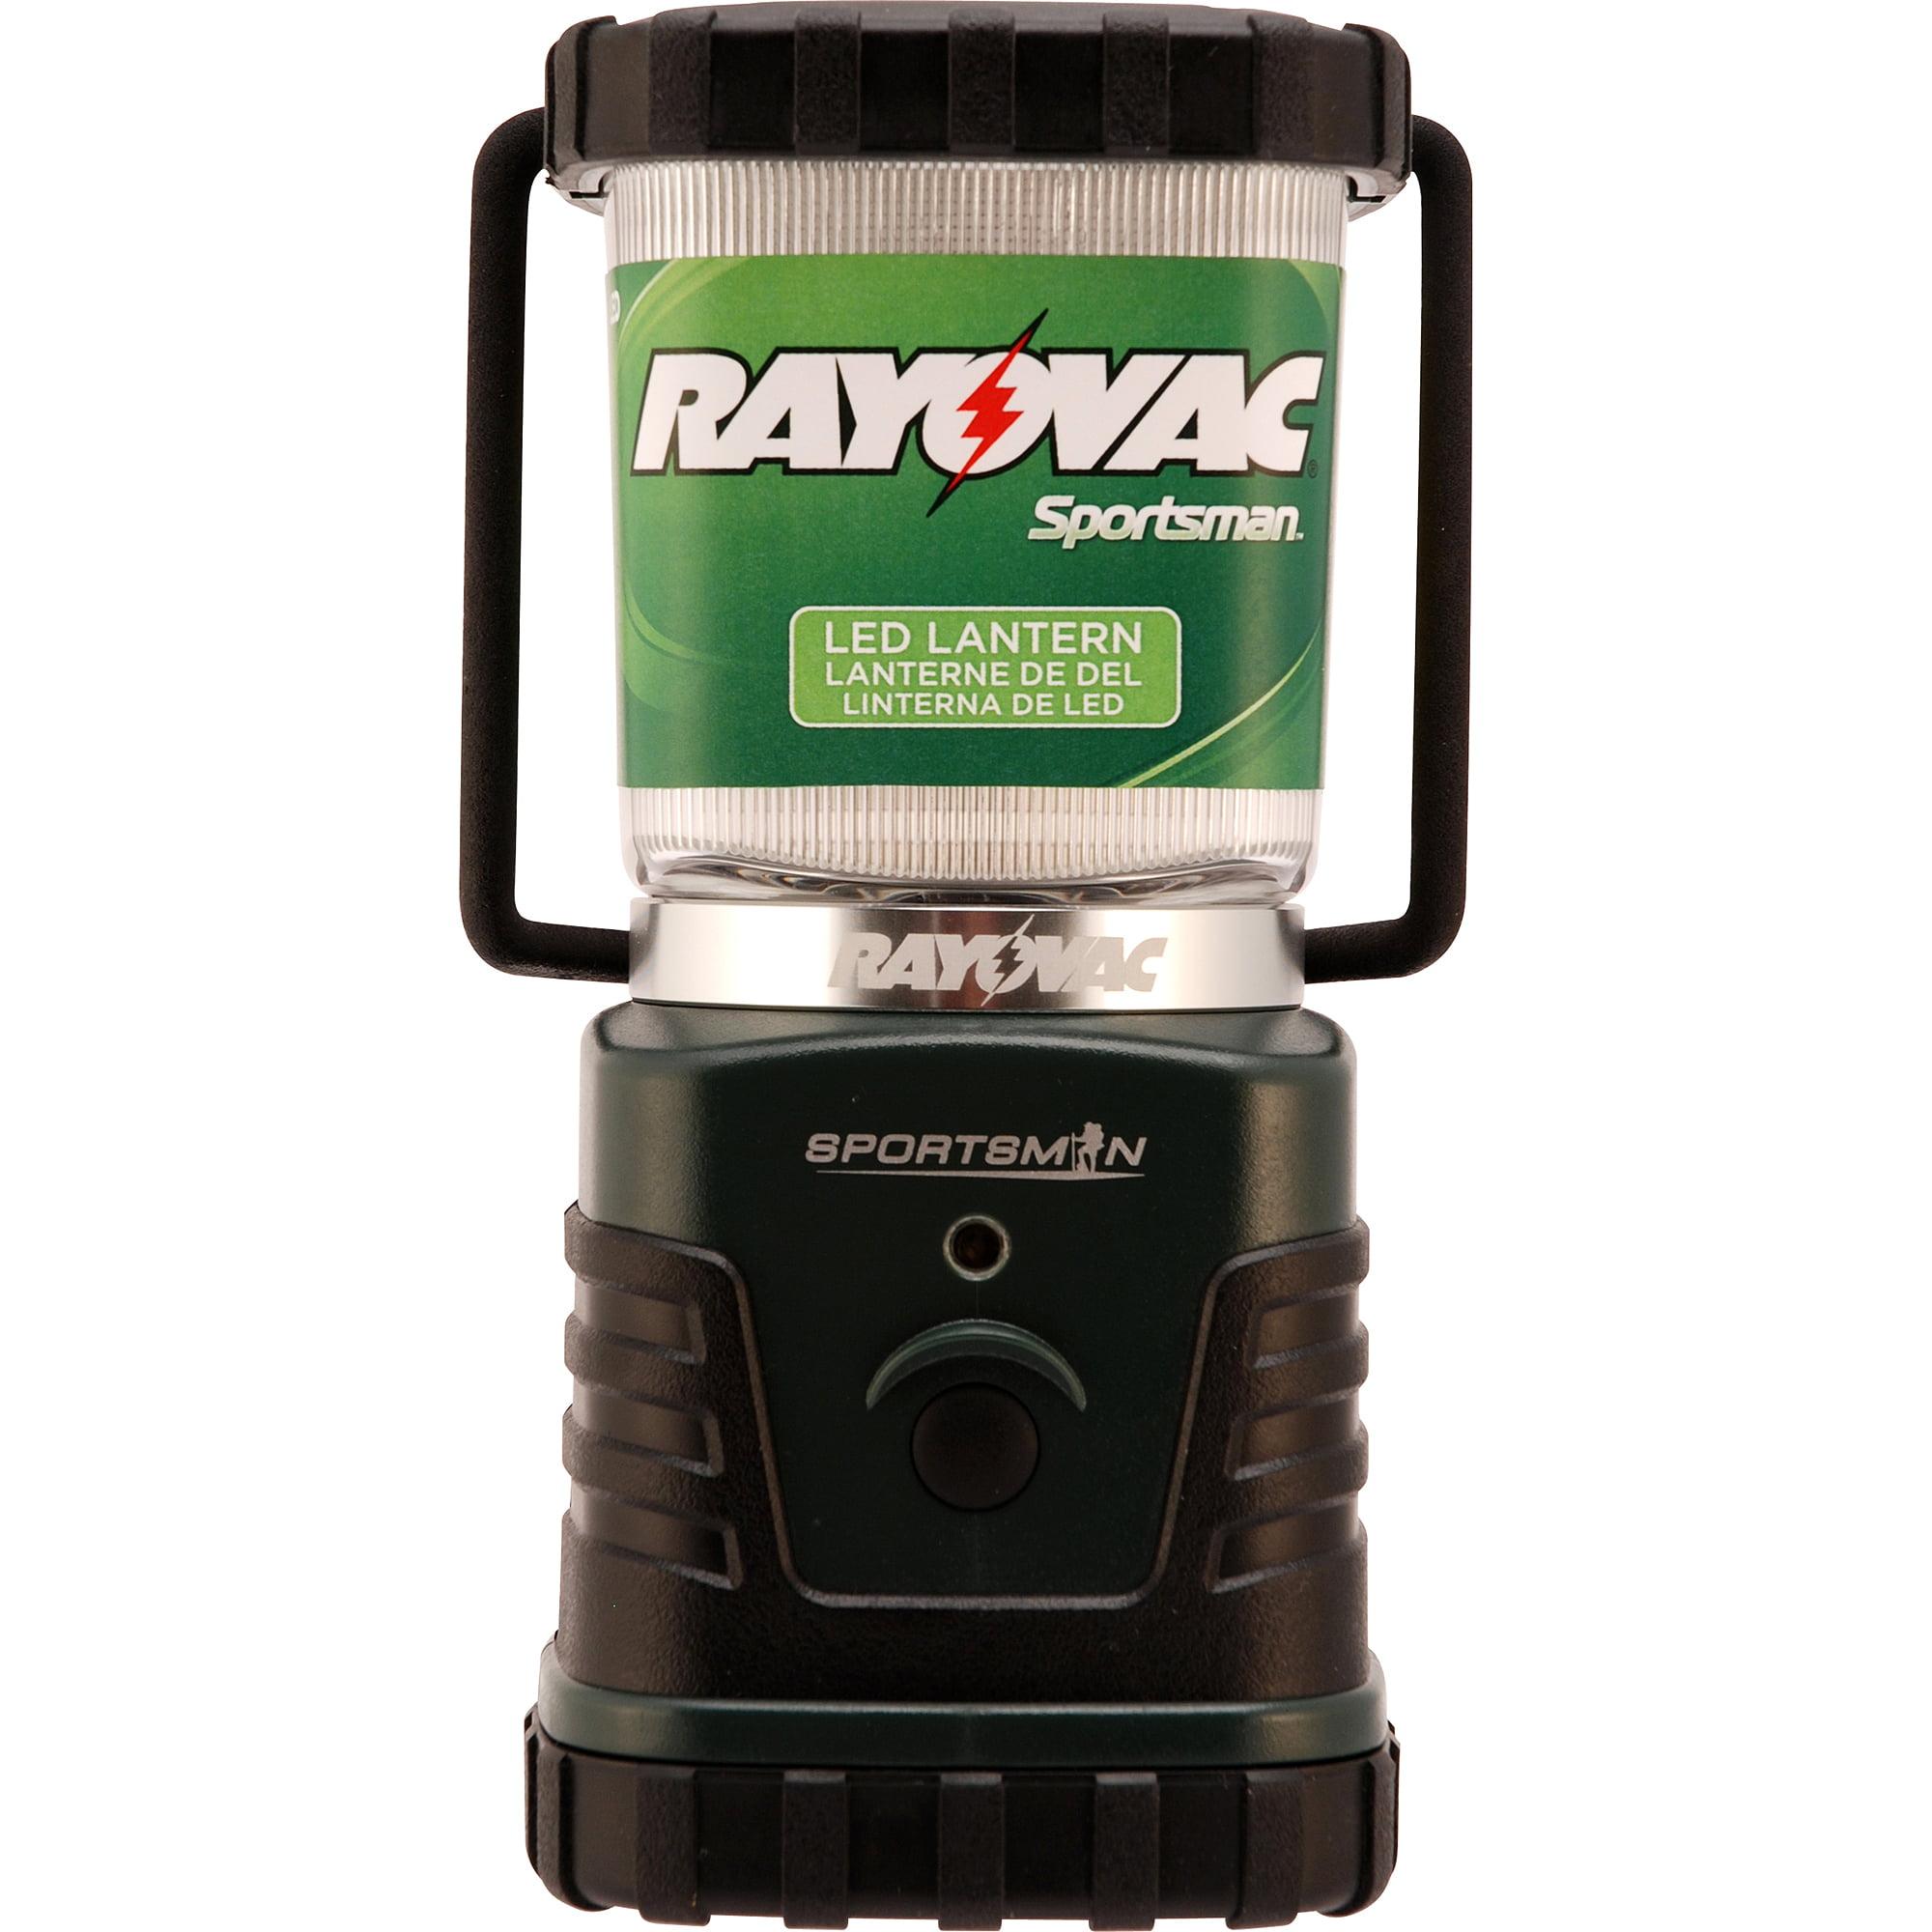 Rayovac Sportsman Xtreme LED Area Lantern, 100-240 Lumens